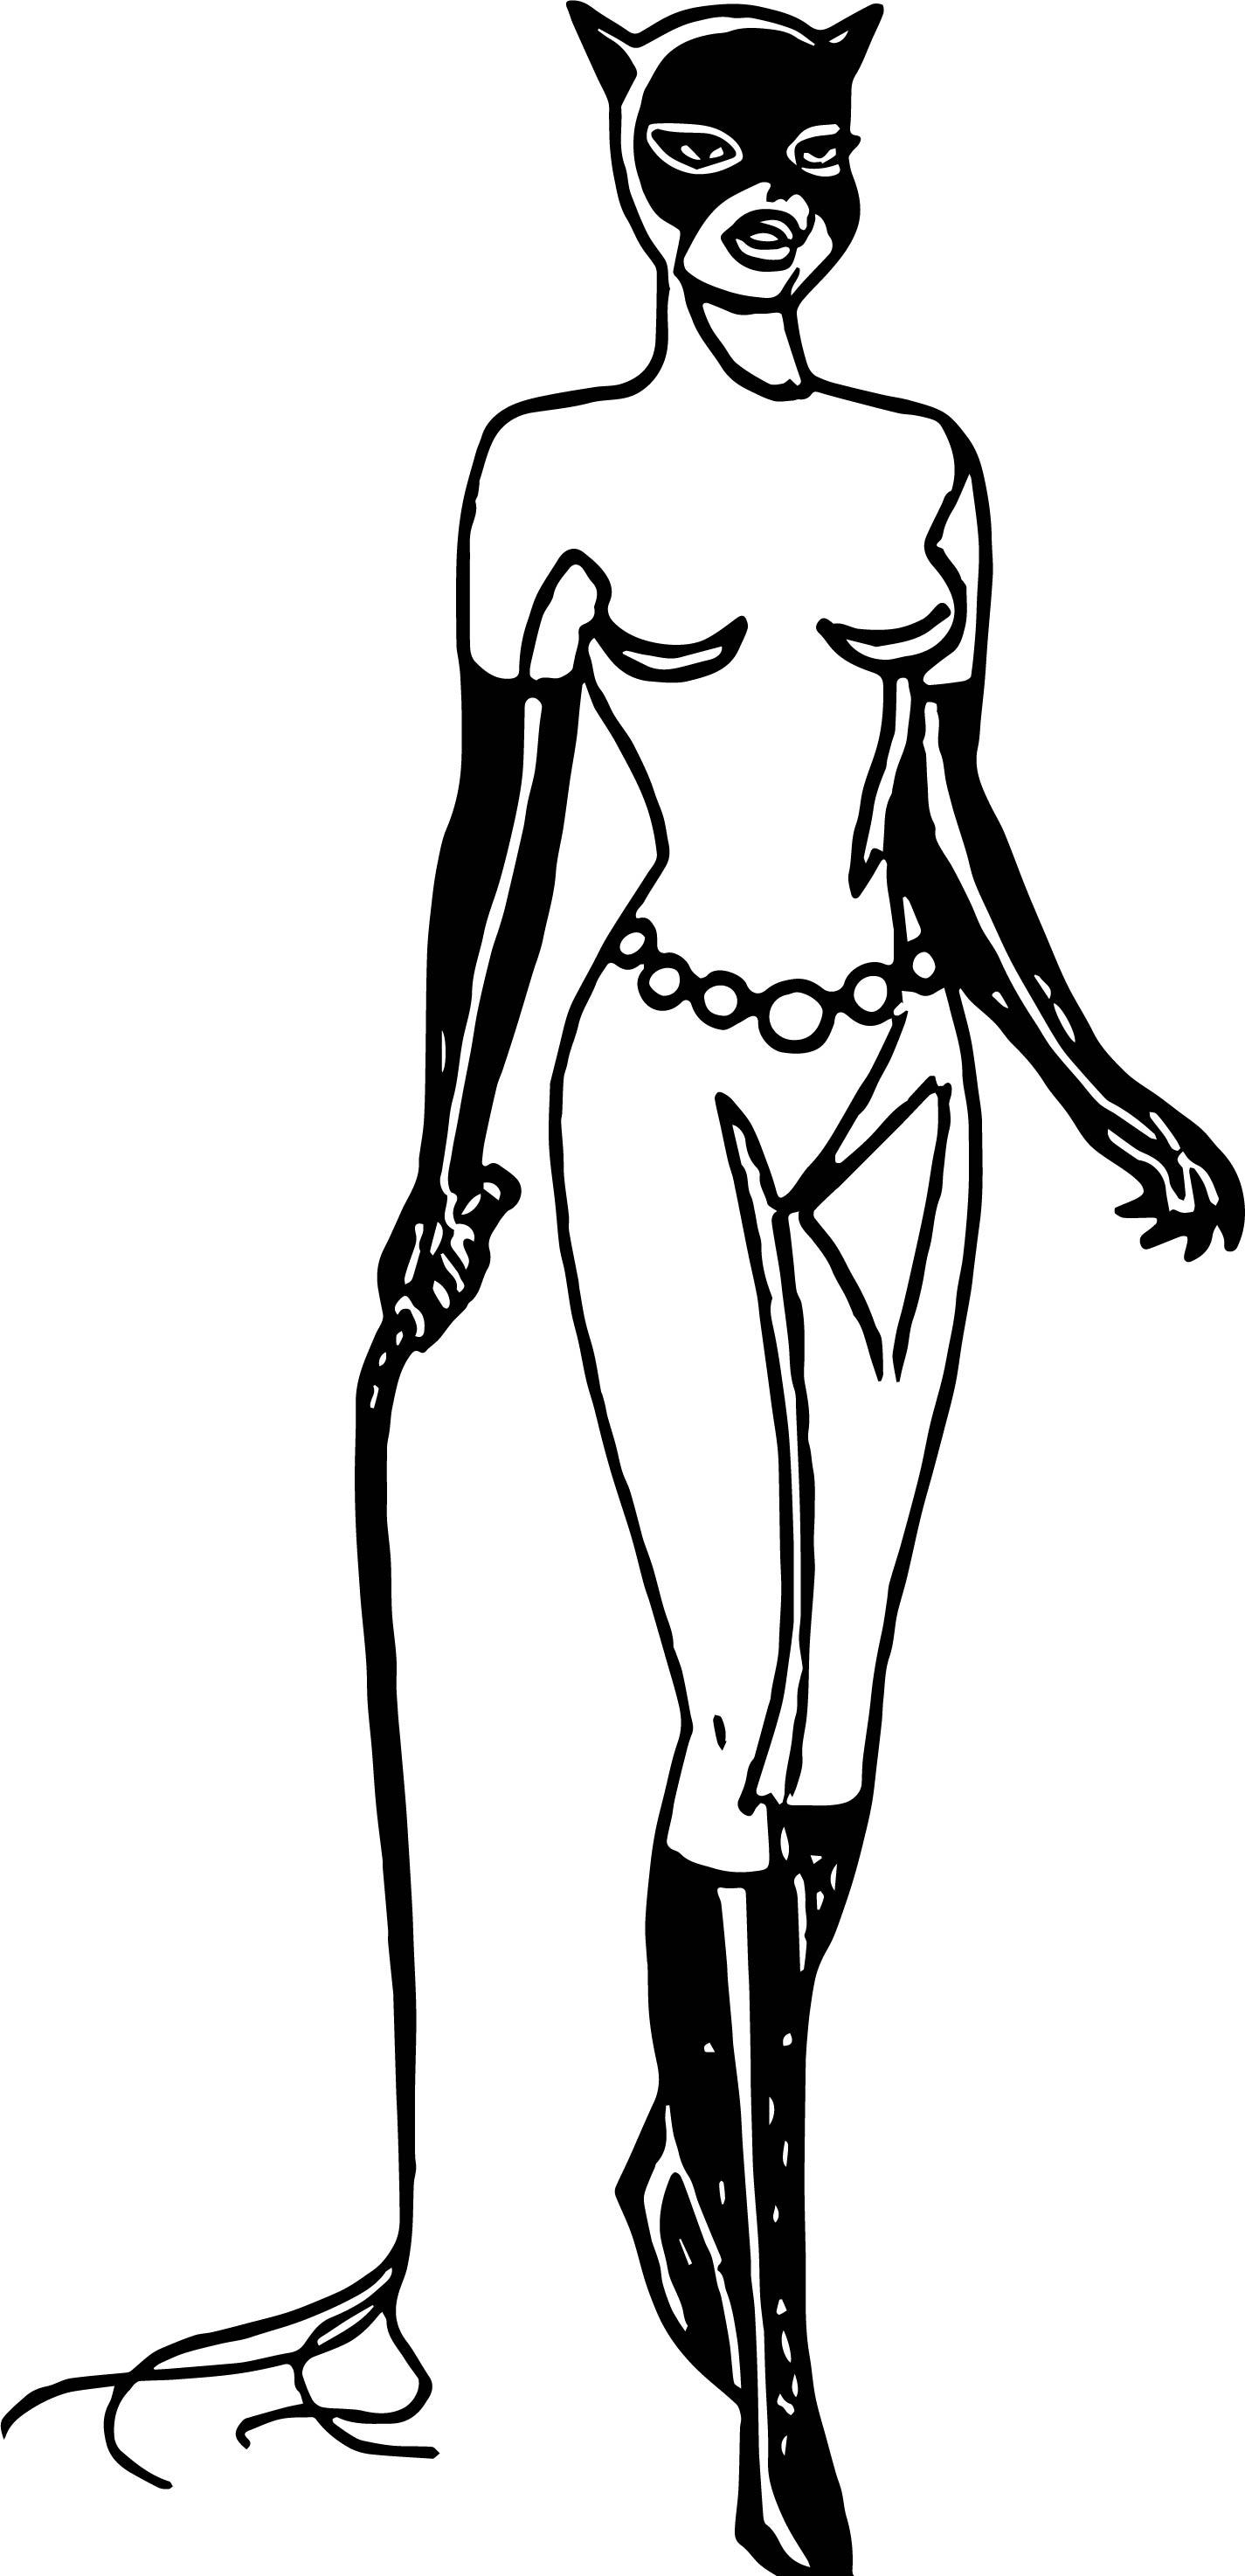 Woman Bat Girl Coloring Page | Wecoloringpage.com